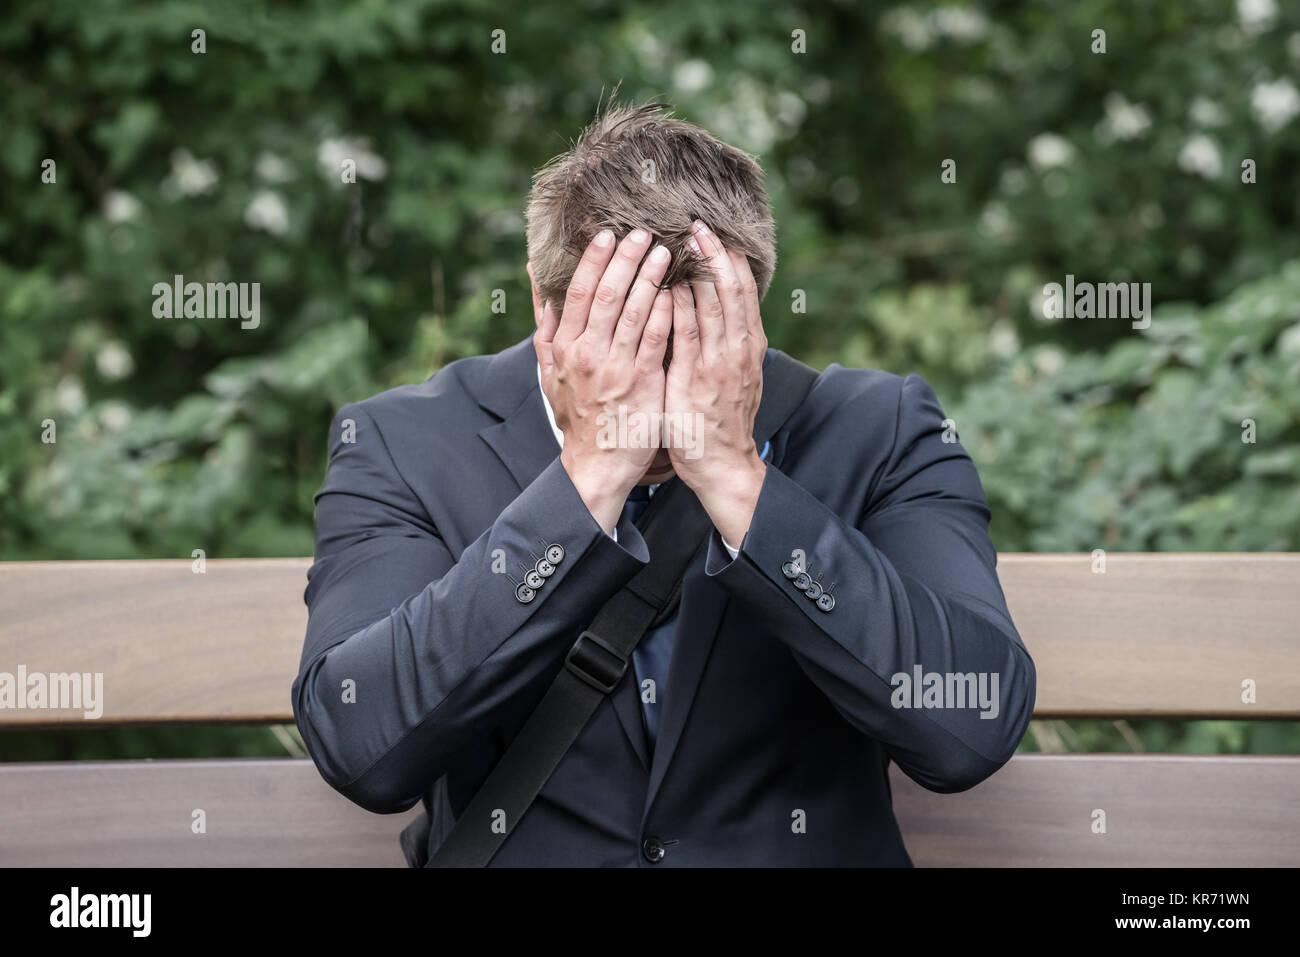 Sad Businessman Sitting On Bench - Stock Image